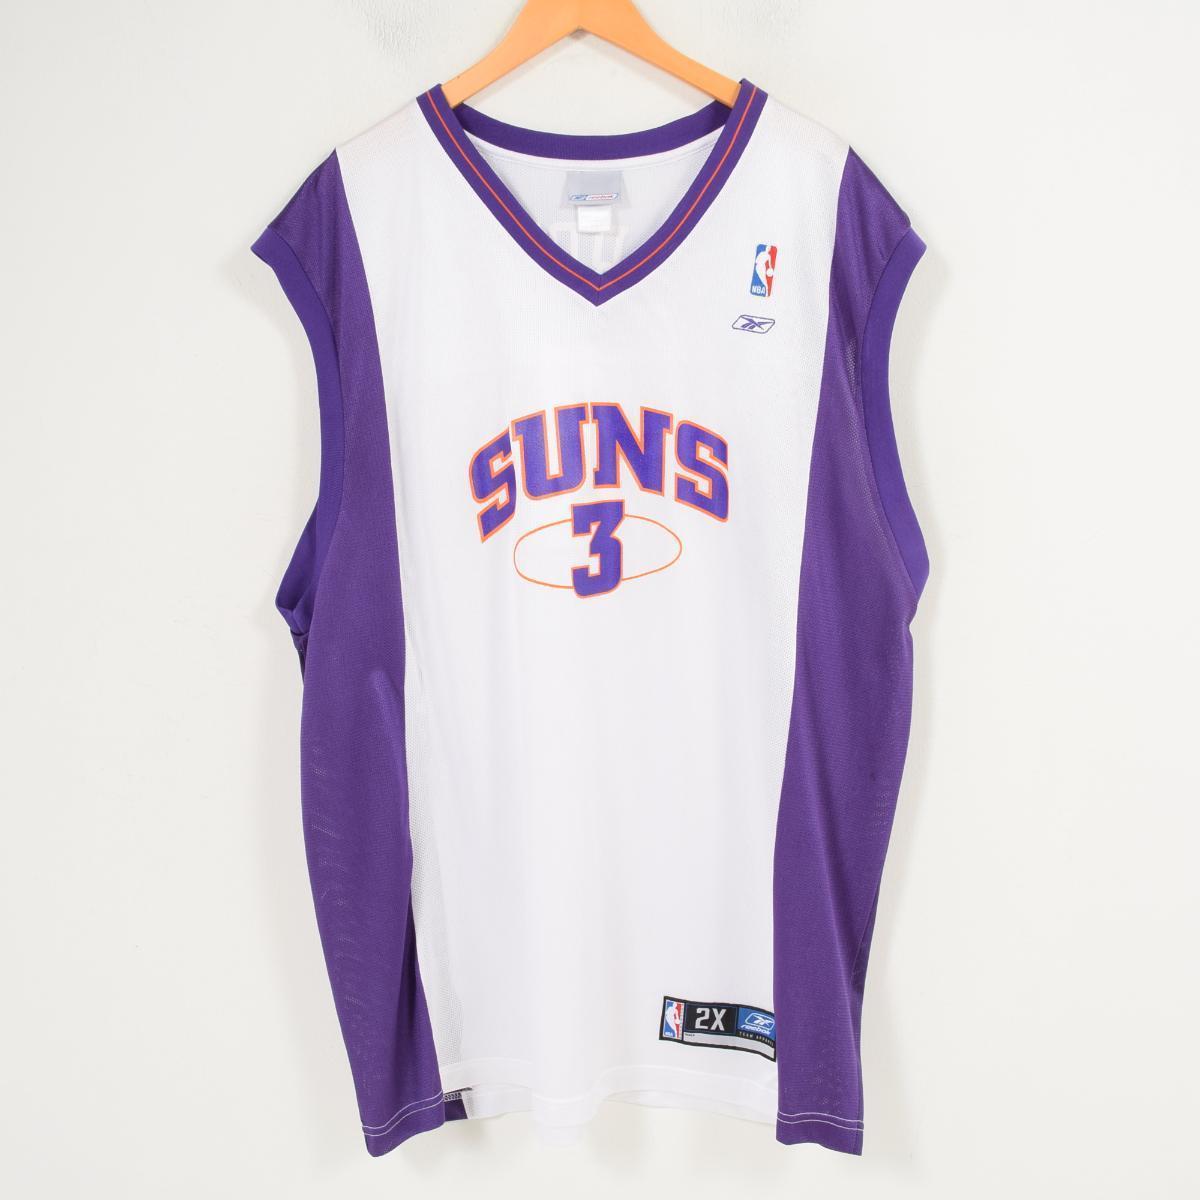 a138281f9a83 Reebok Reebok NBA PHOENIX SUNS Phoenix Suns Stephon Marbury Stephon Marbury  game shirt replica uniform men XXL  wap0666